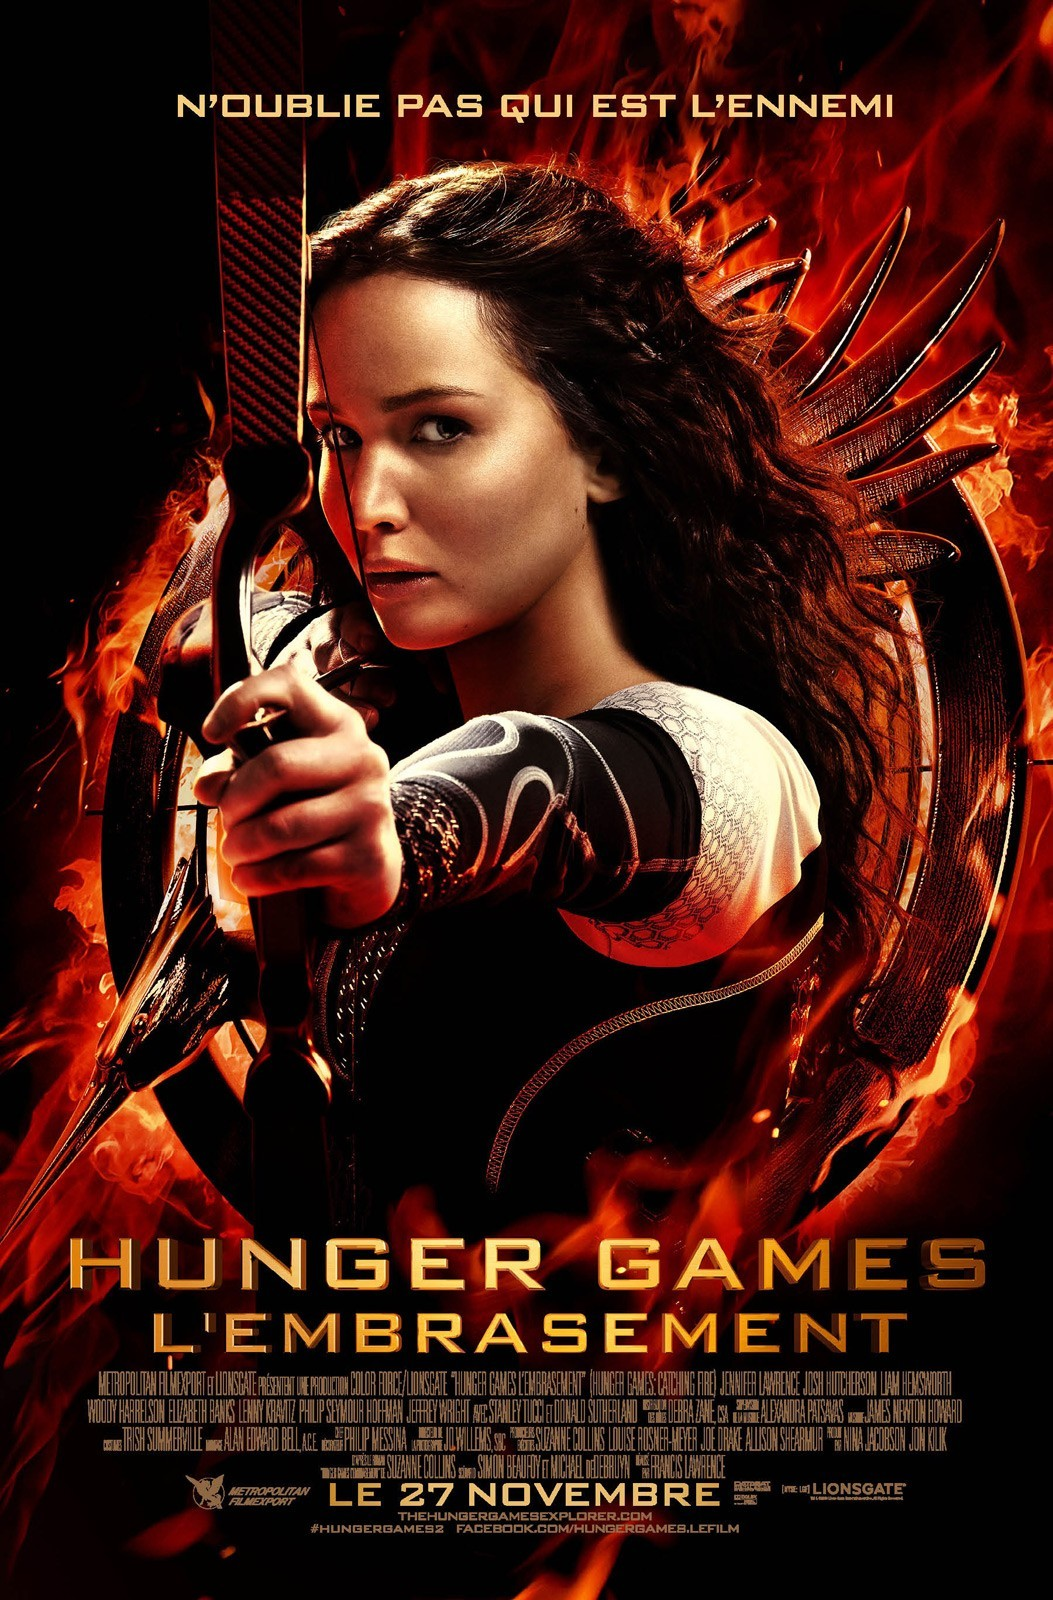 Hunger Games (film 2)